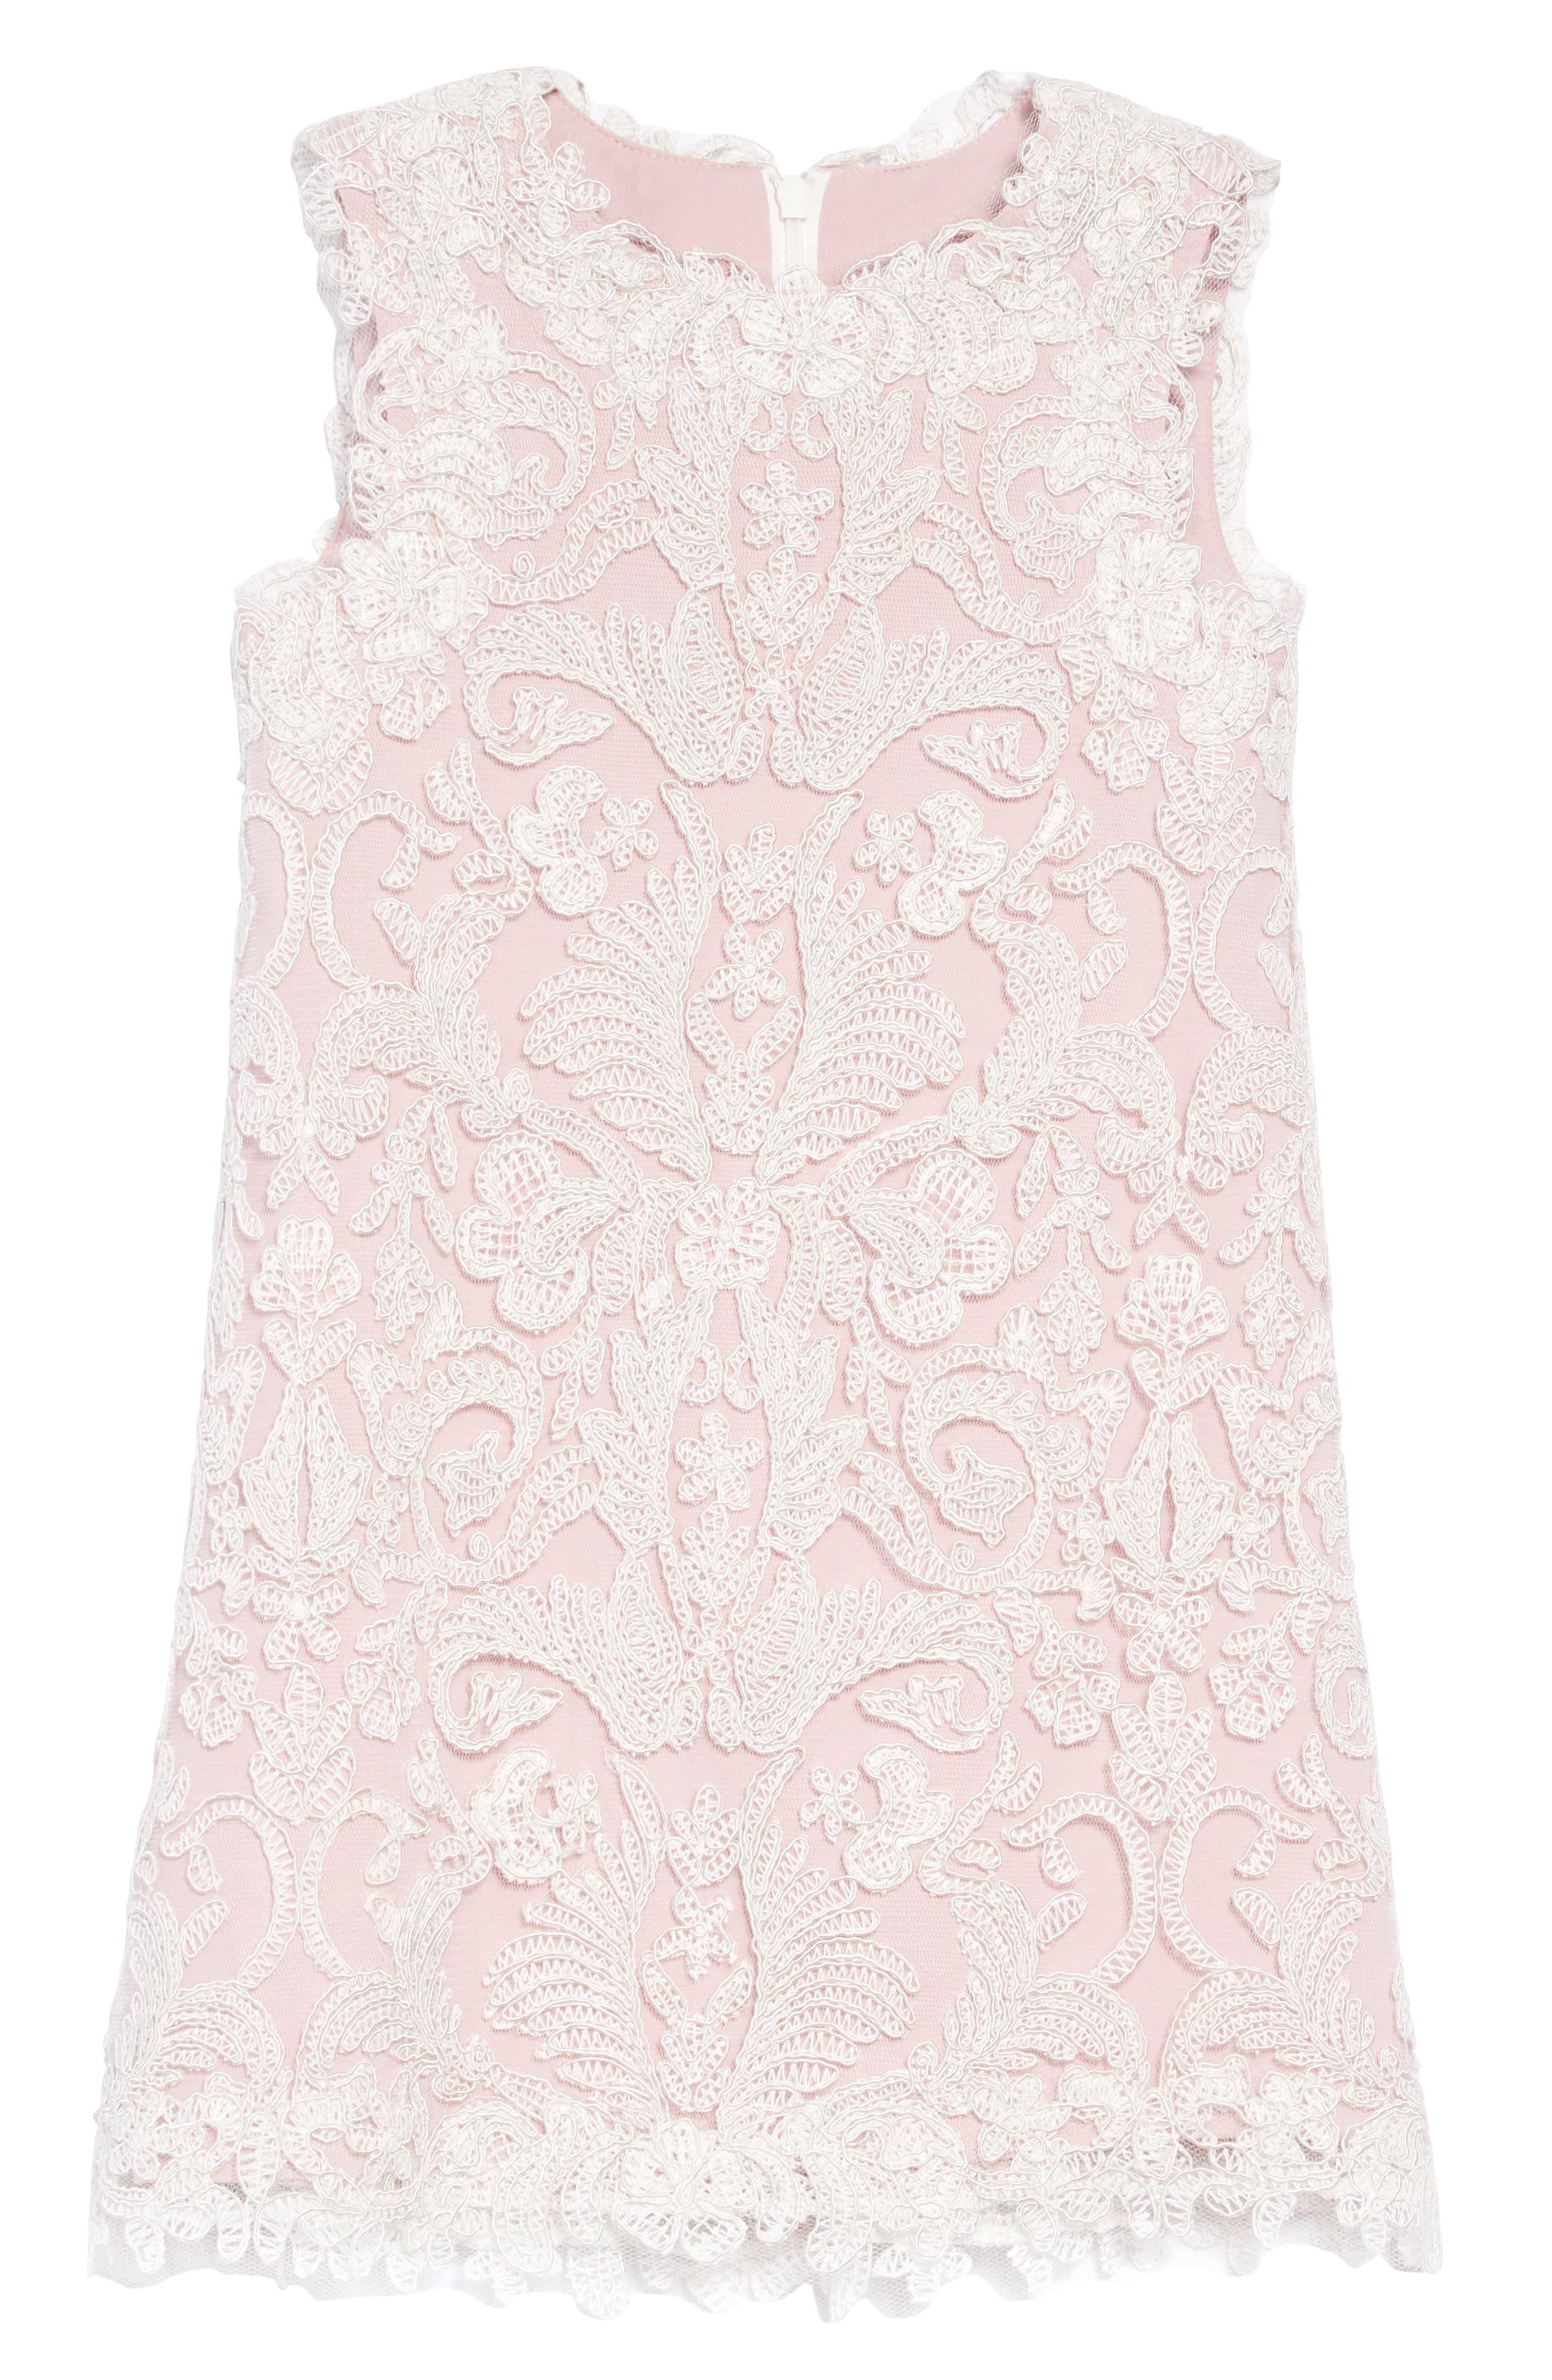 Embroidered Sheath Dress, Main, color, IVORY/ PETAL